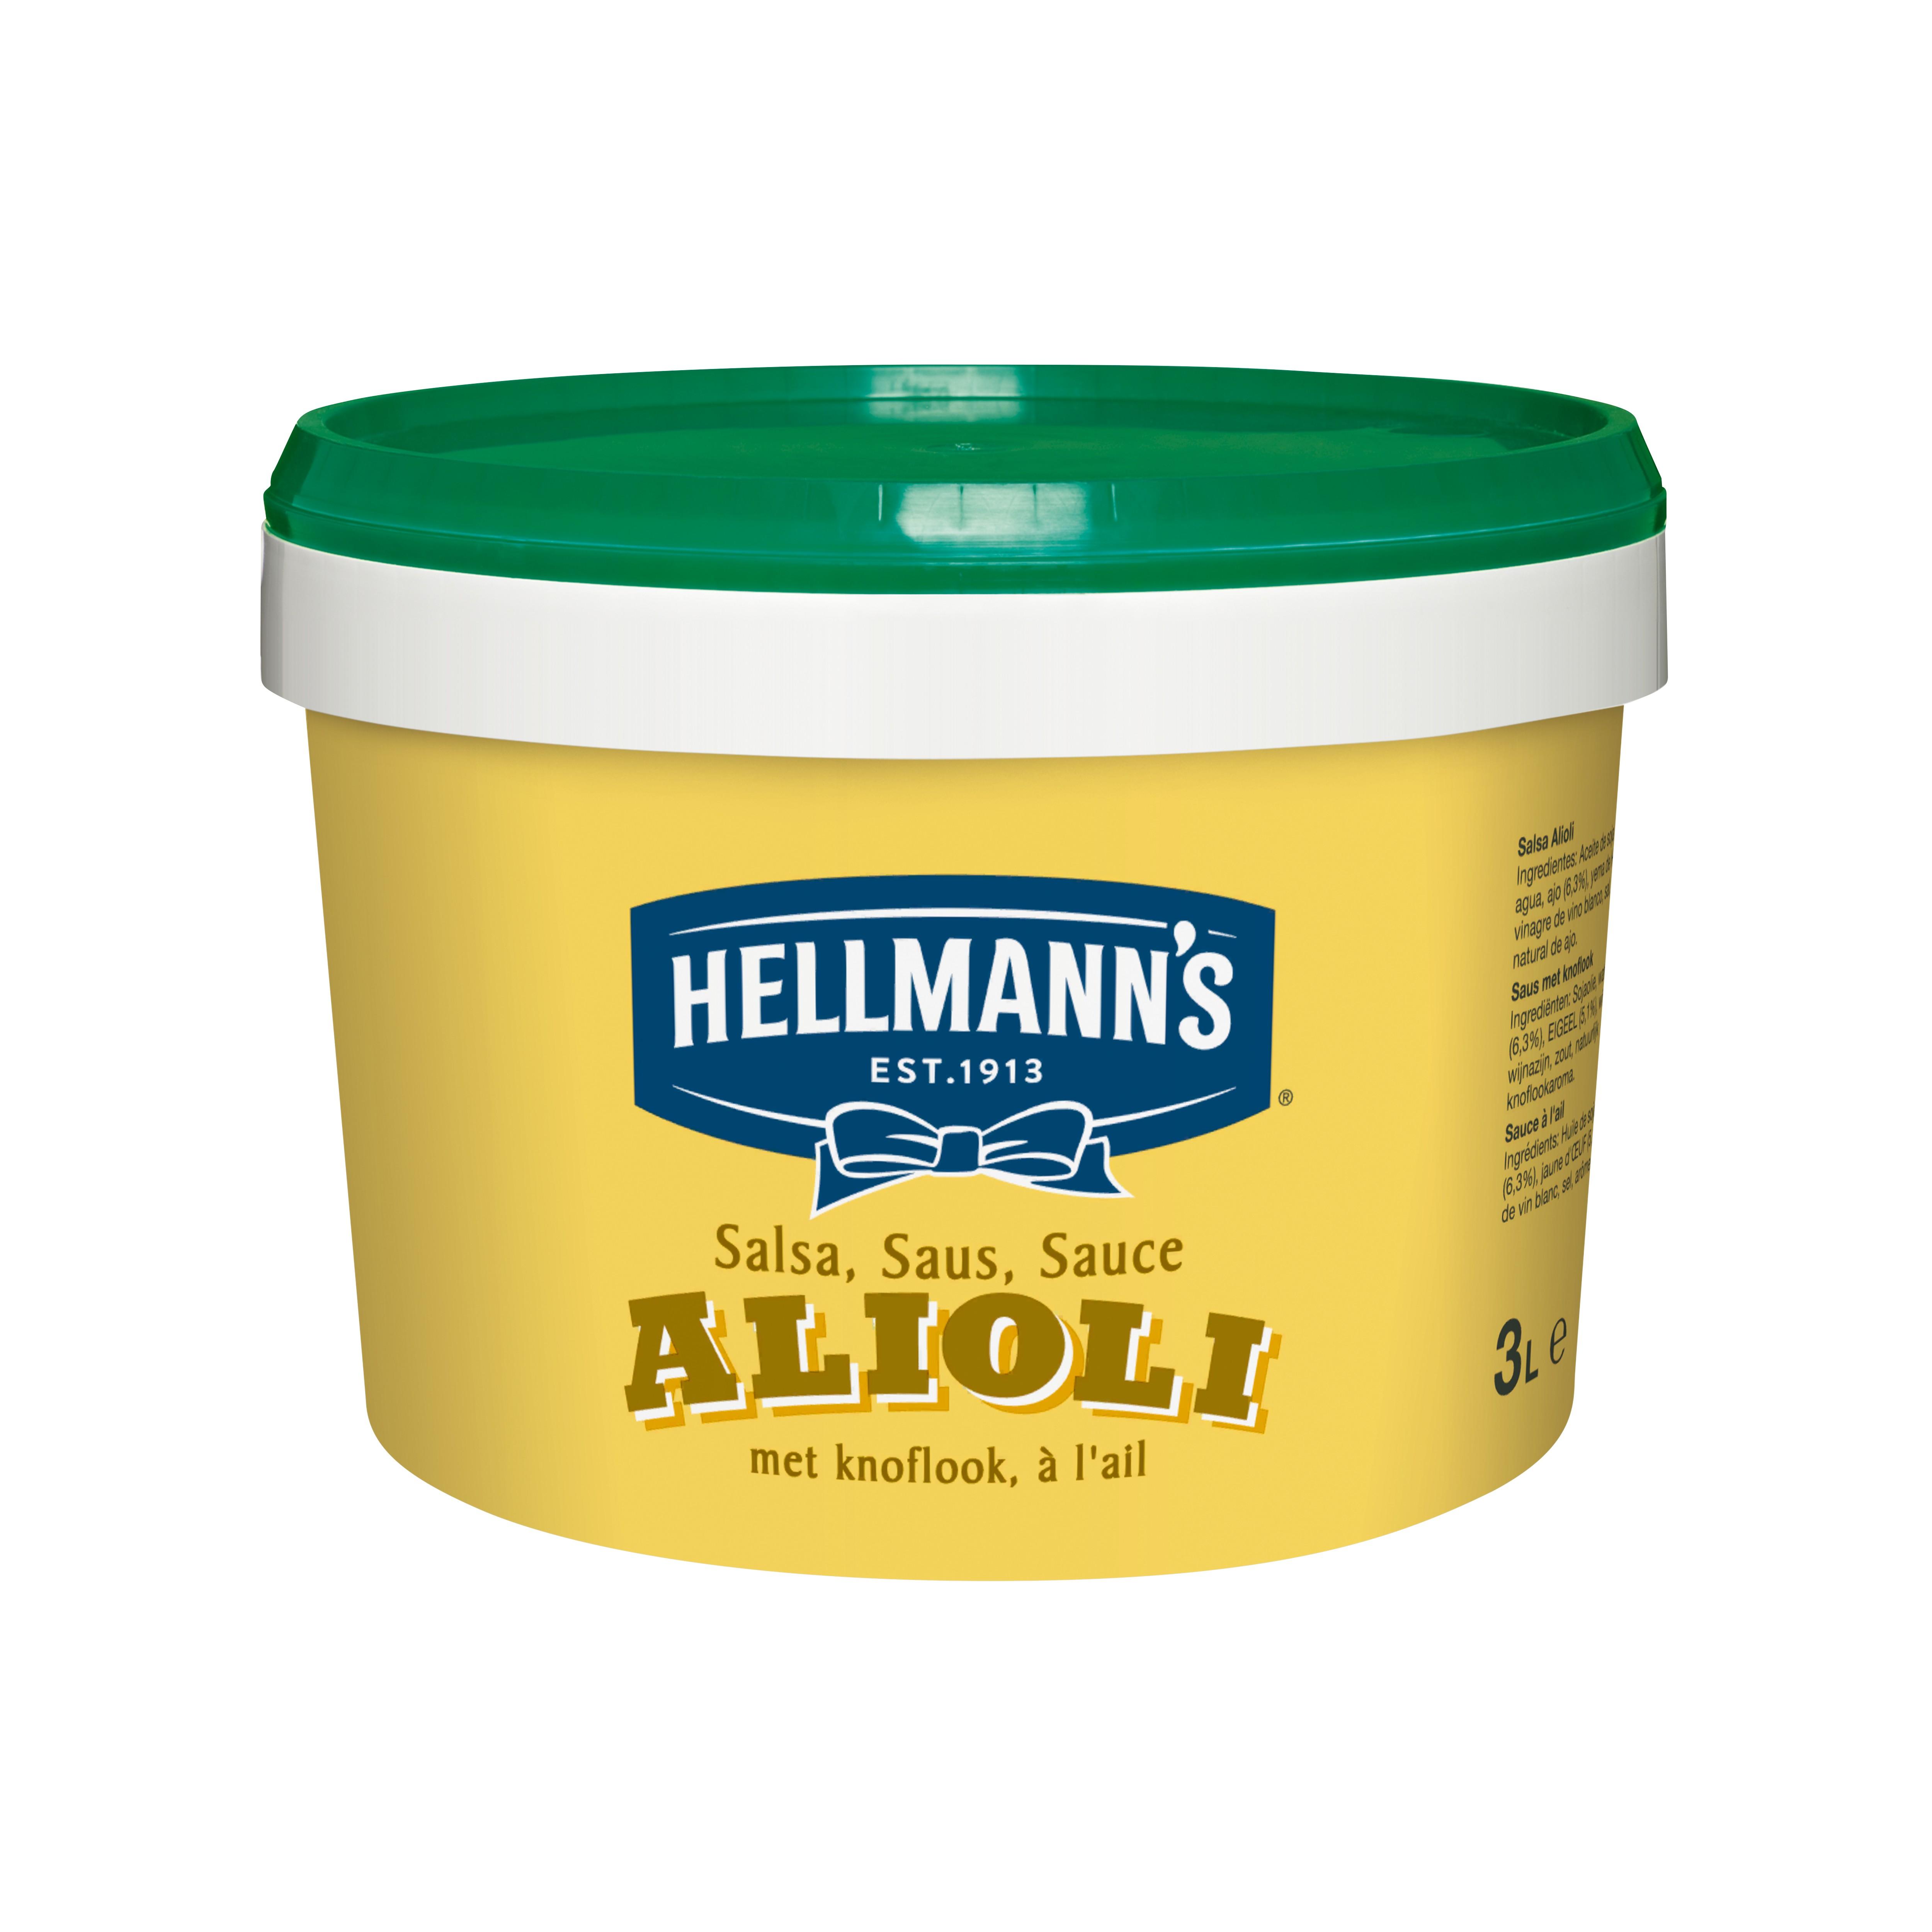 Hellmann's Aioli